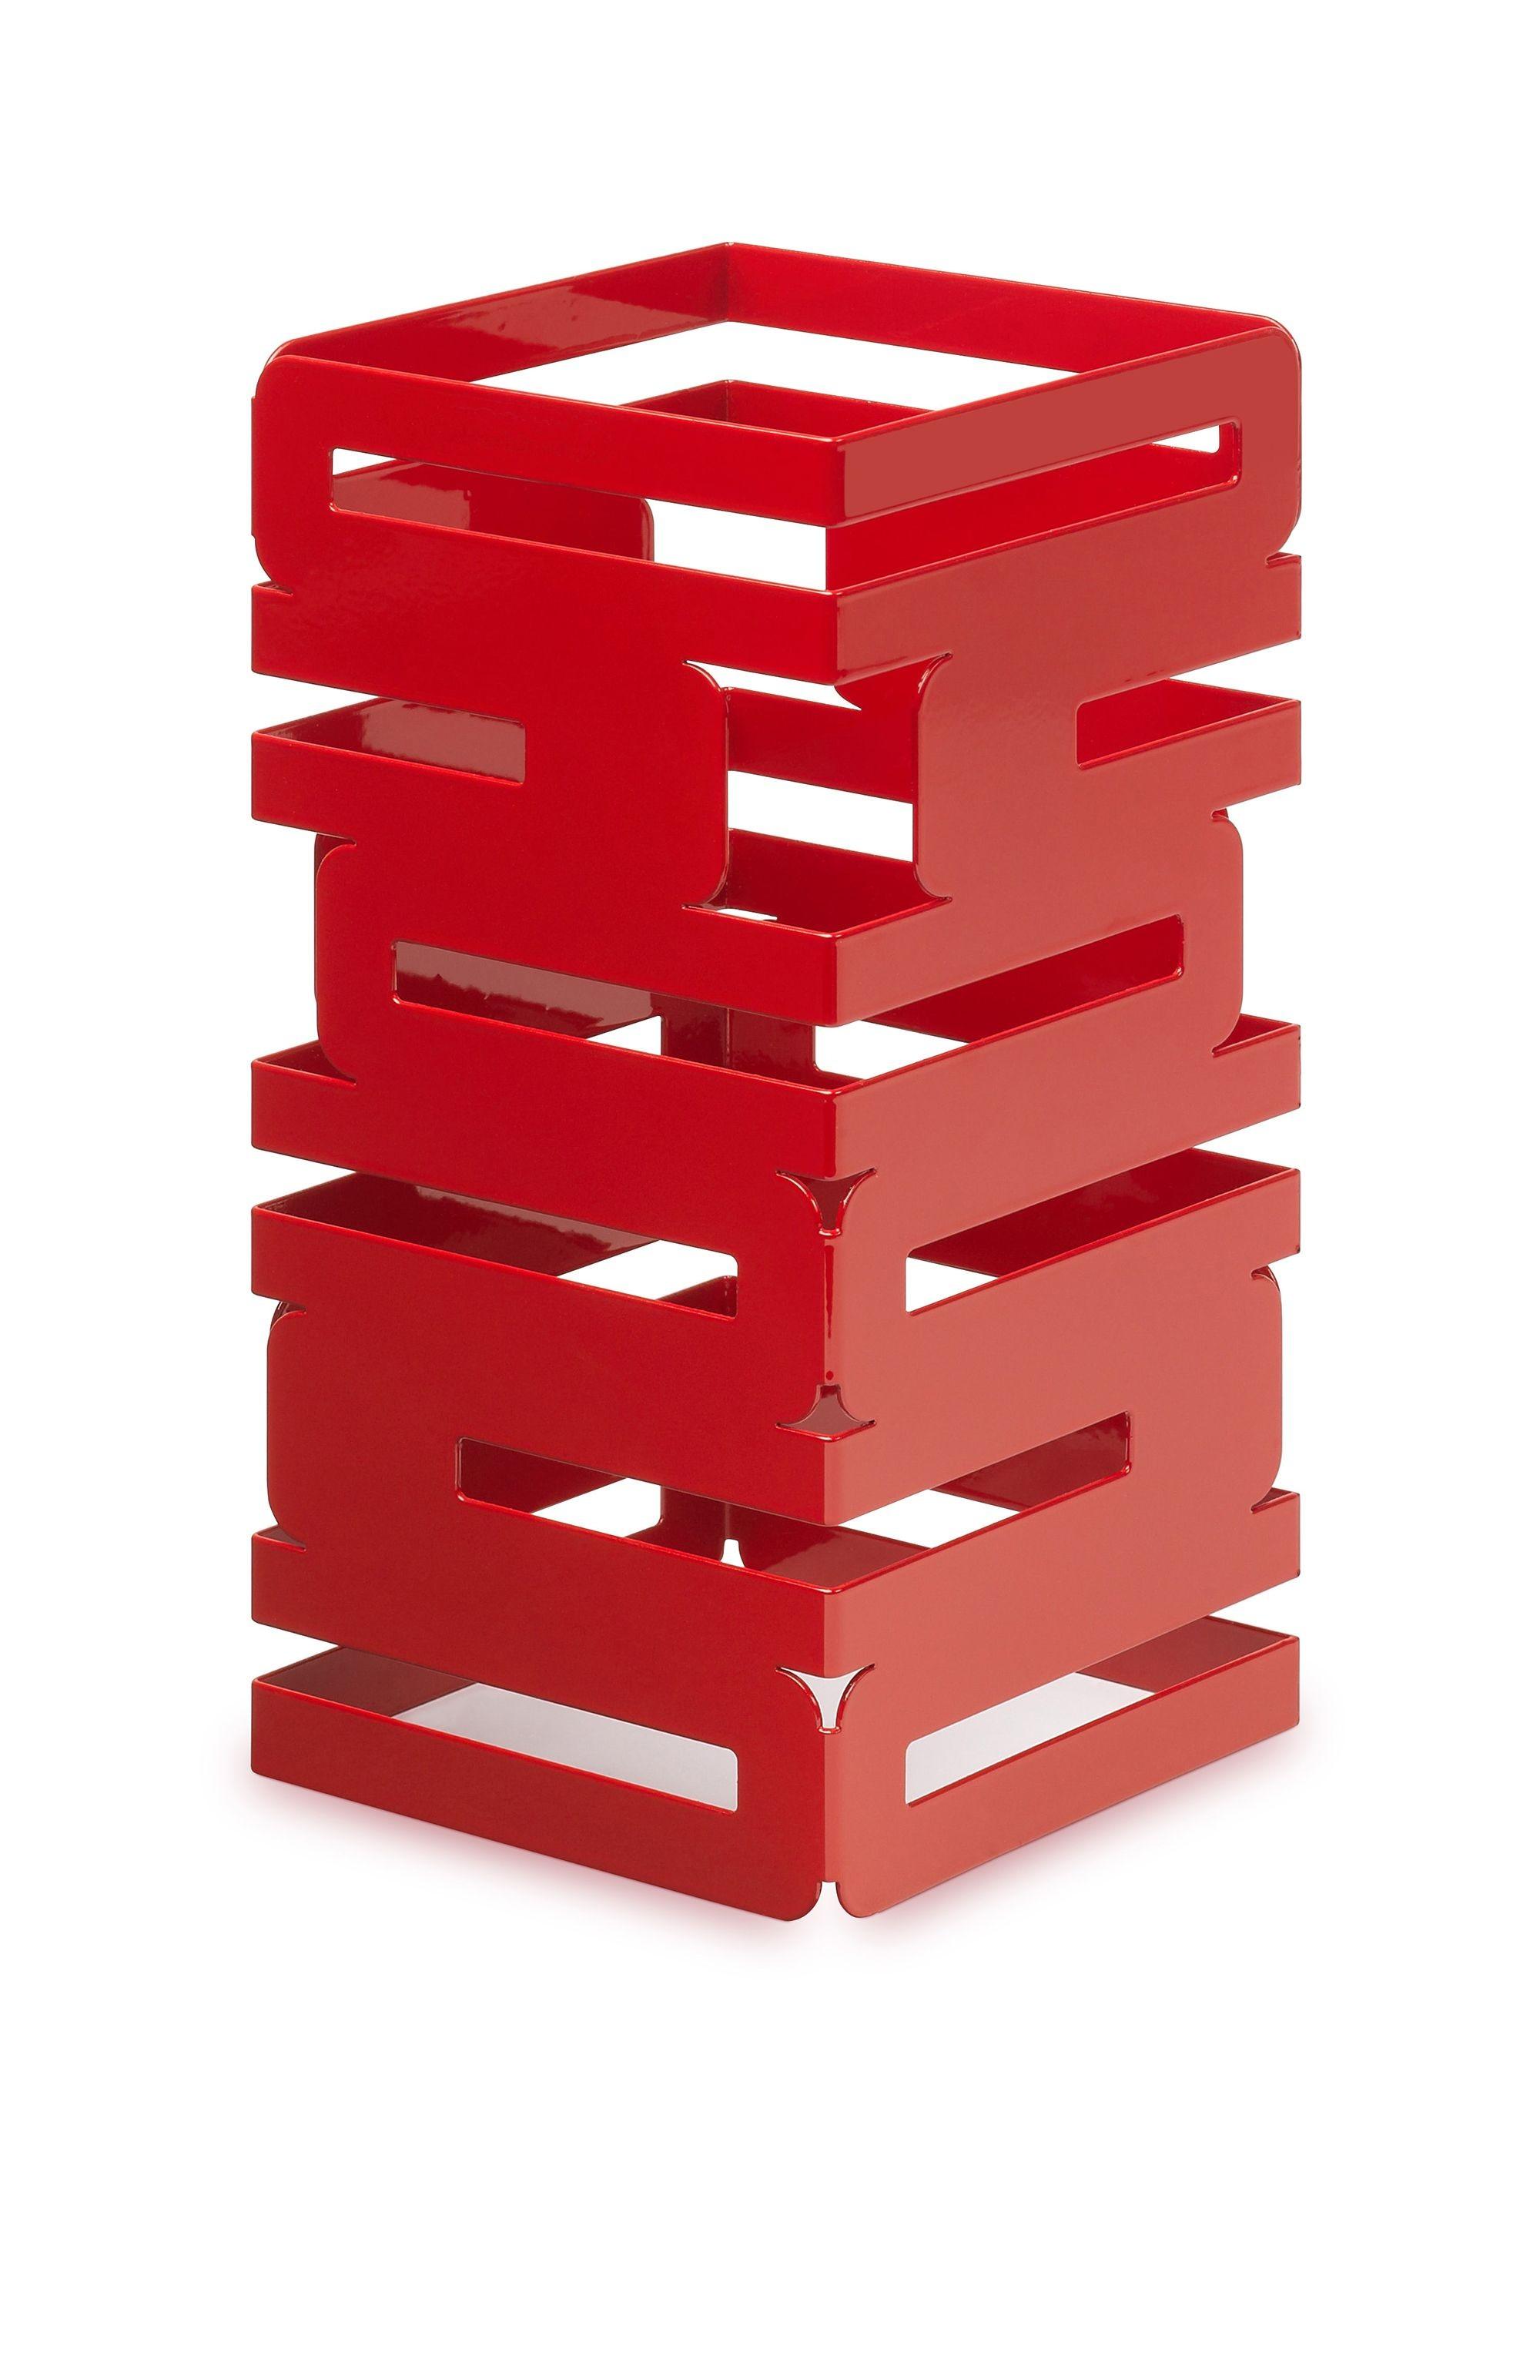 "Rosseto SM186 Skycap Red Gloss Steel Square Multi-Level Riser 6"" x 6"" x 12""H"